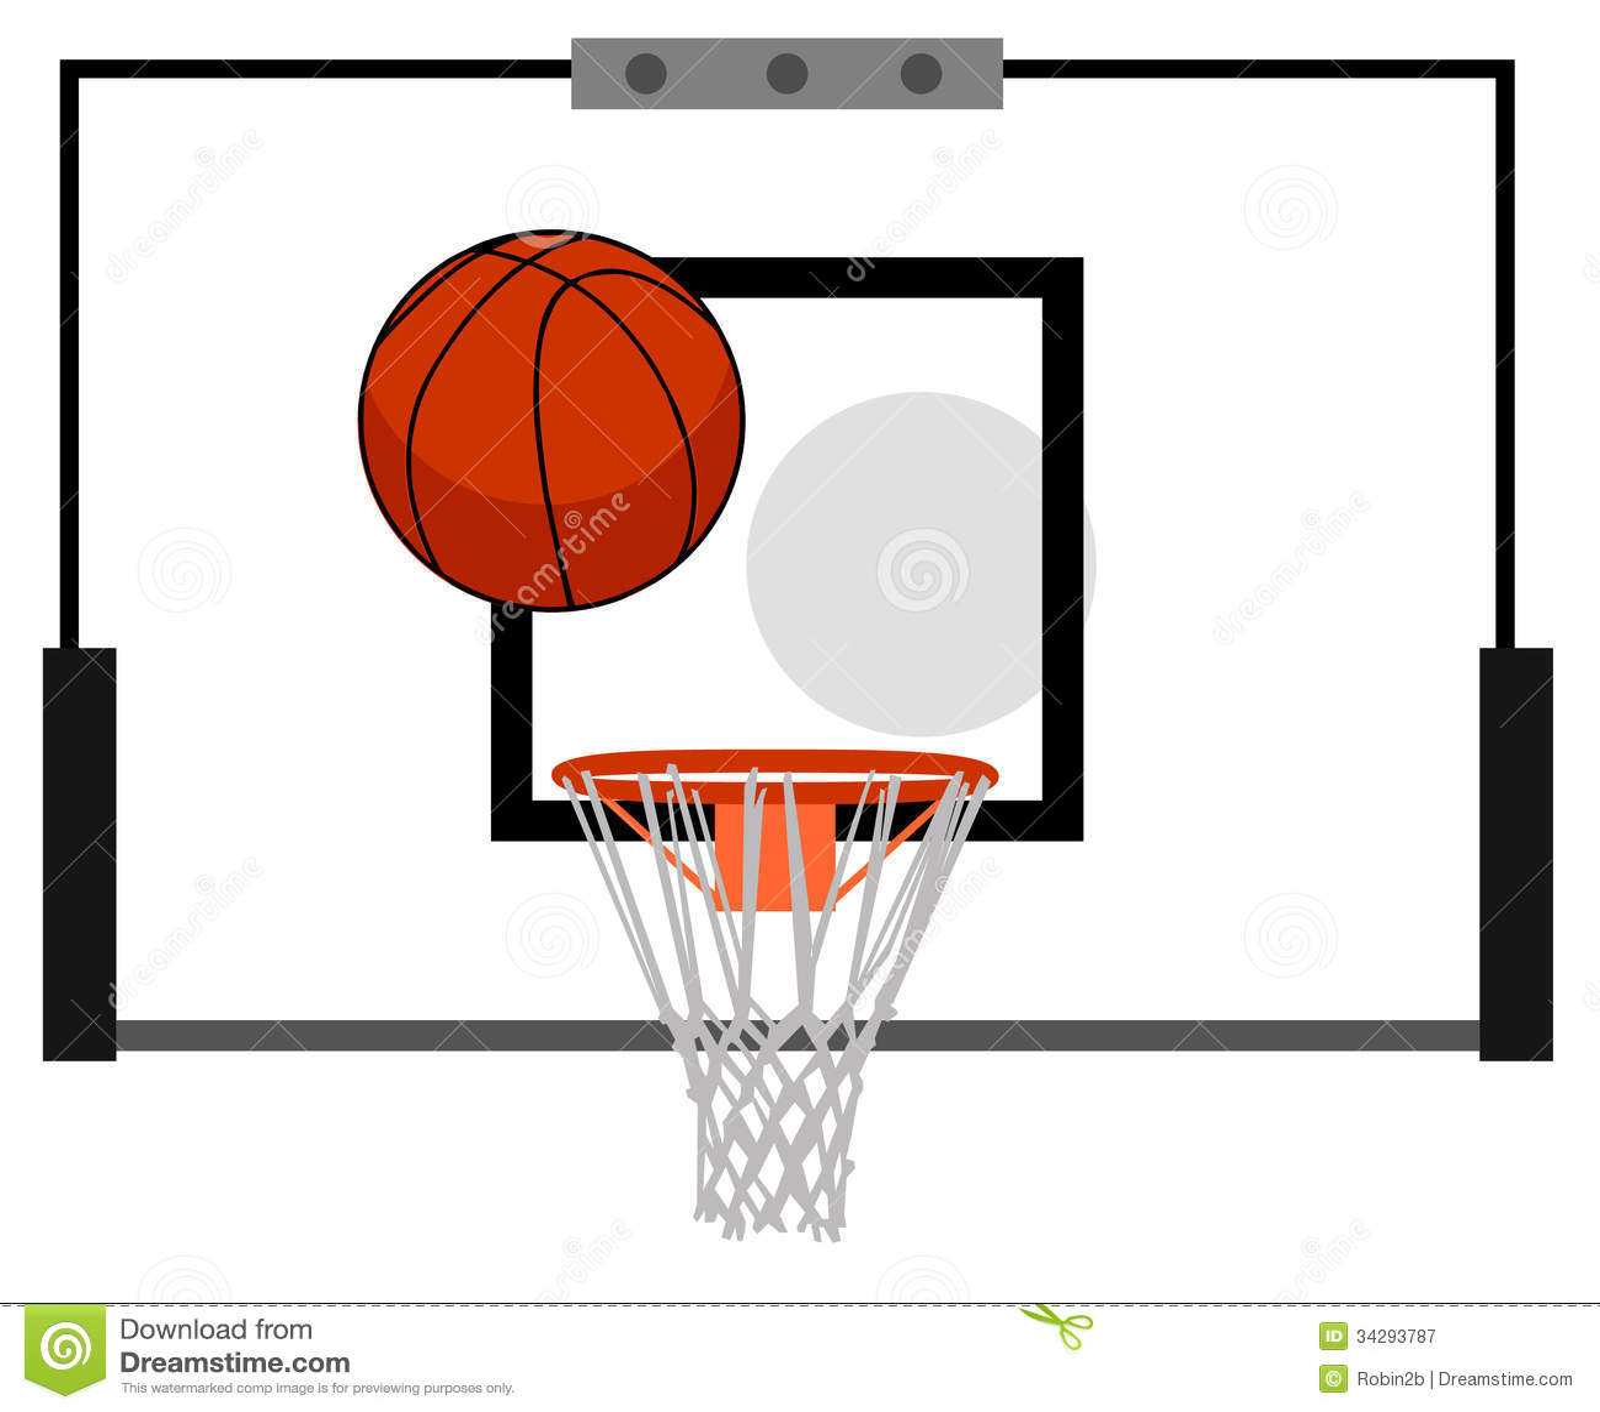 u of m basketball wallpaper